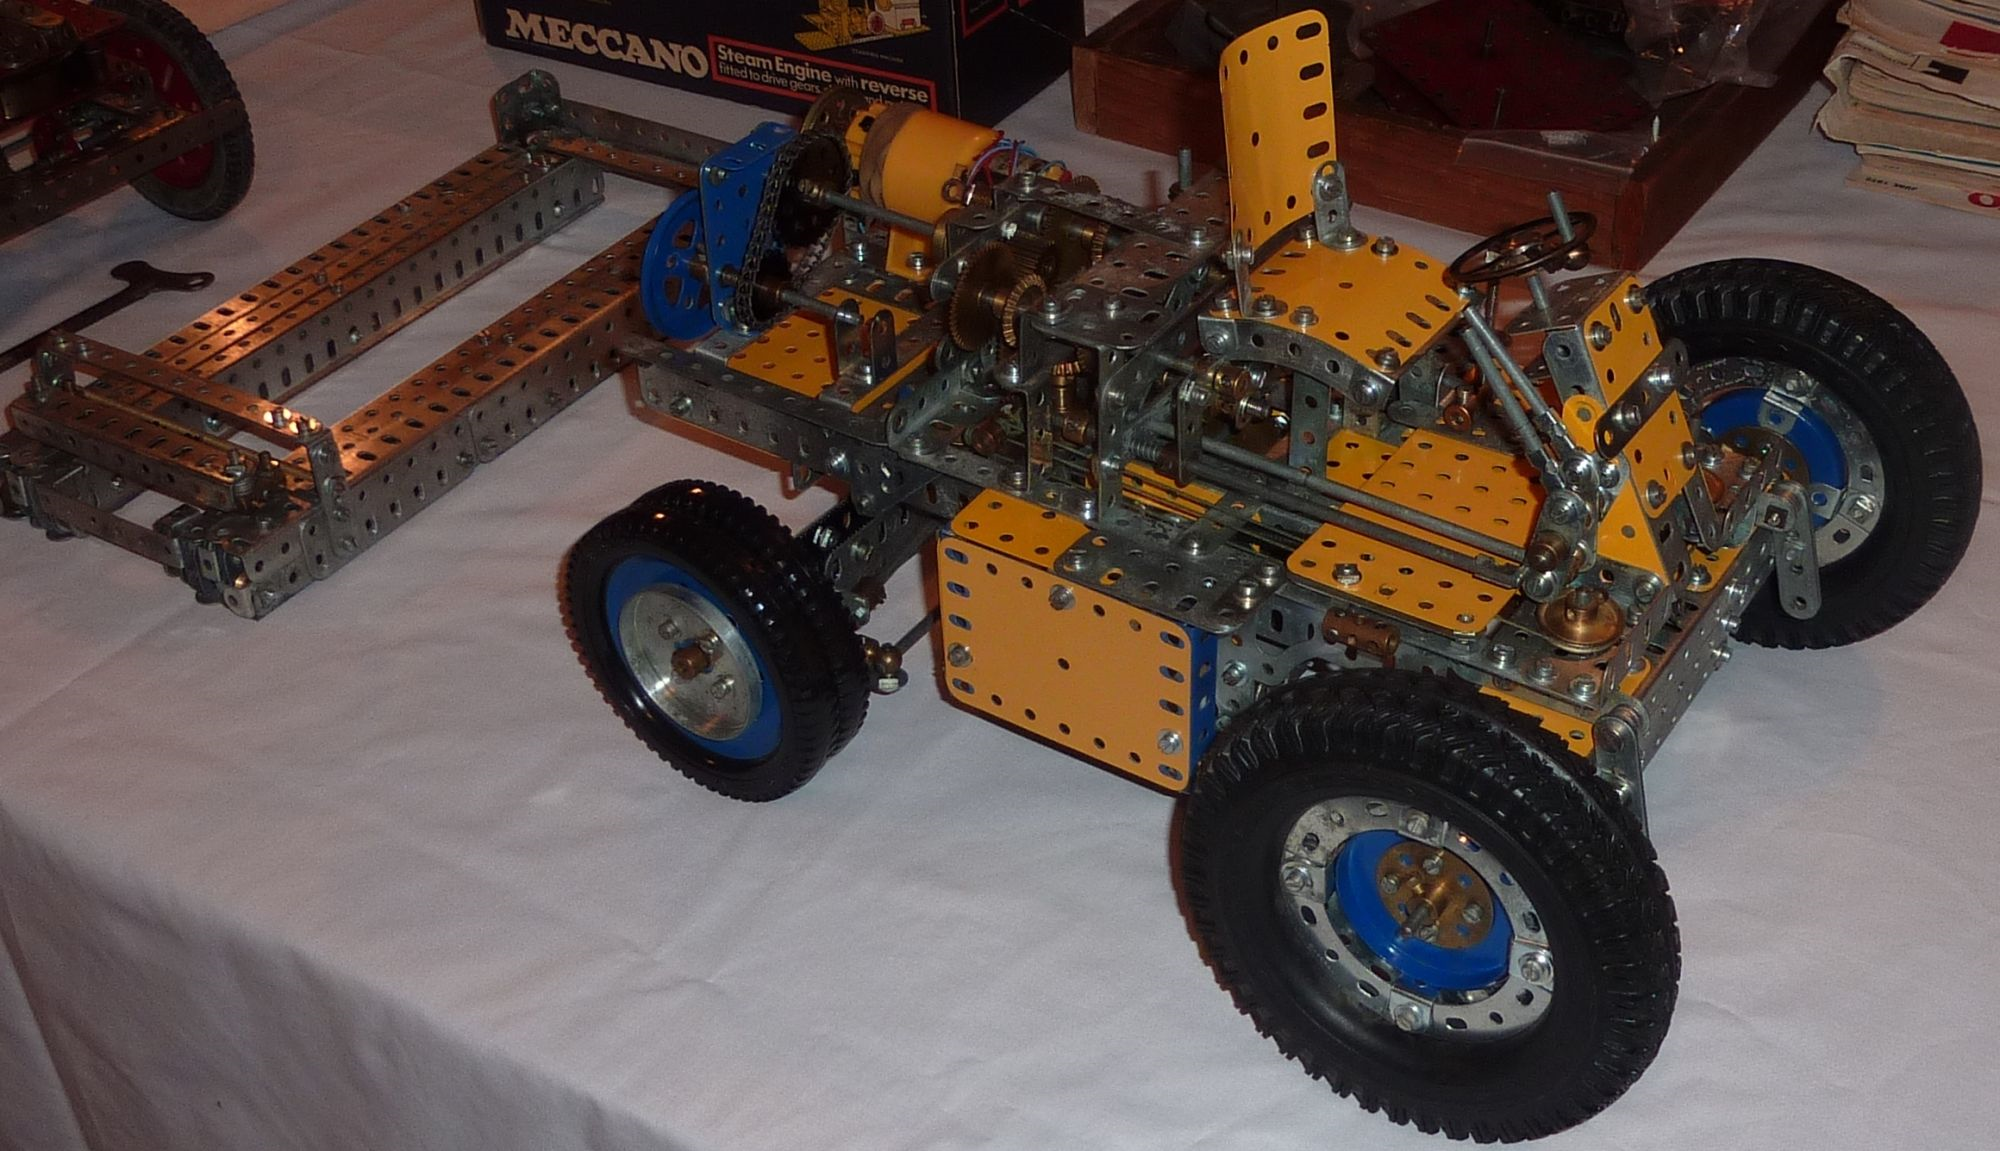 2011 October Fork-lift truck model in progress by John Day